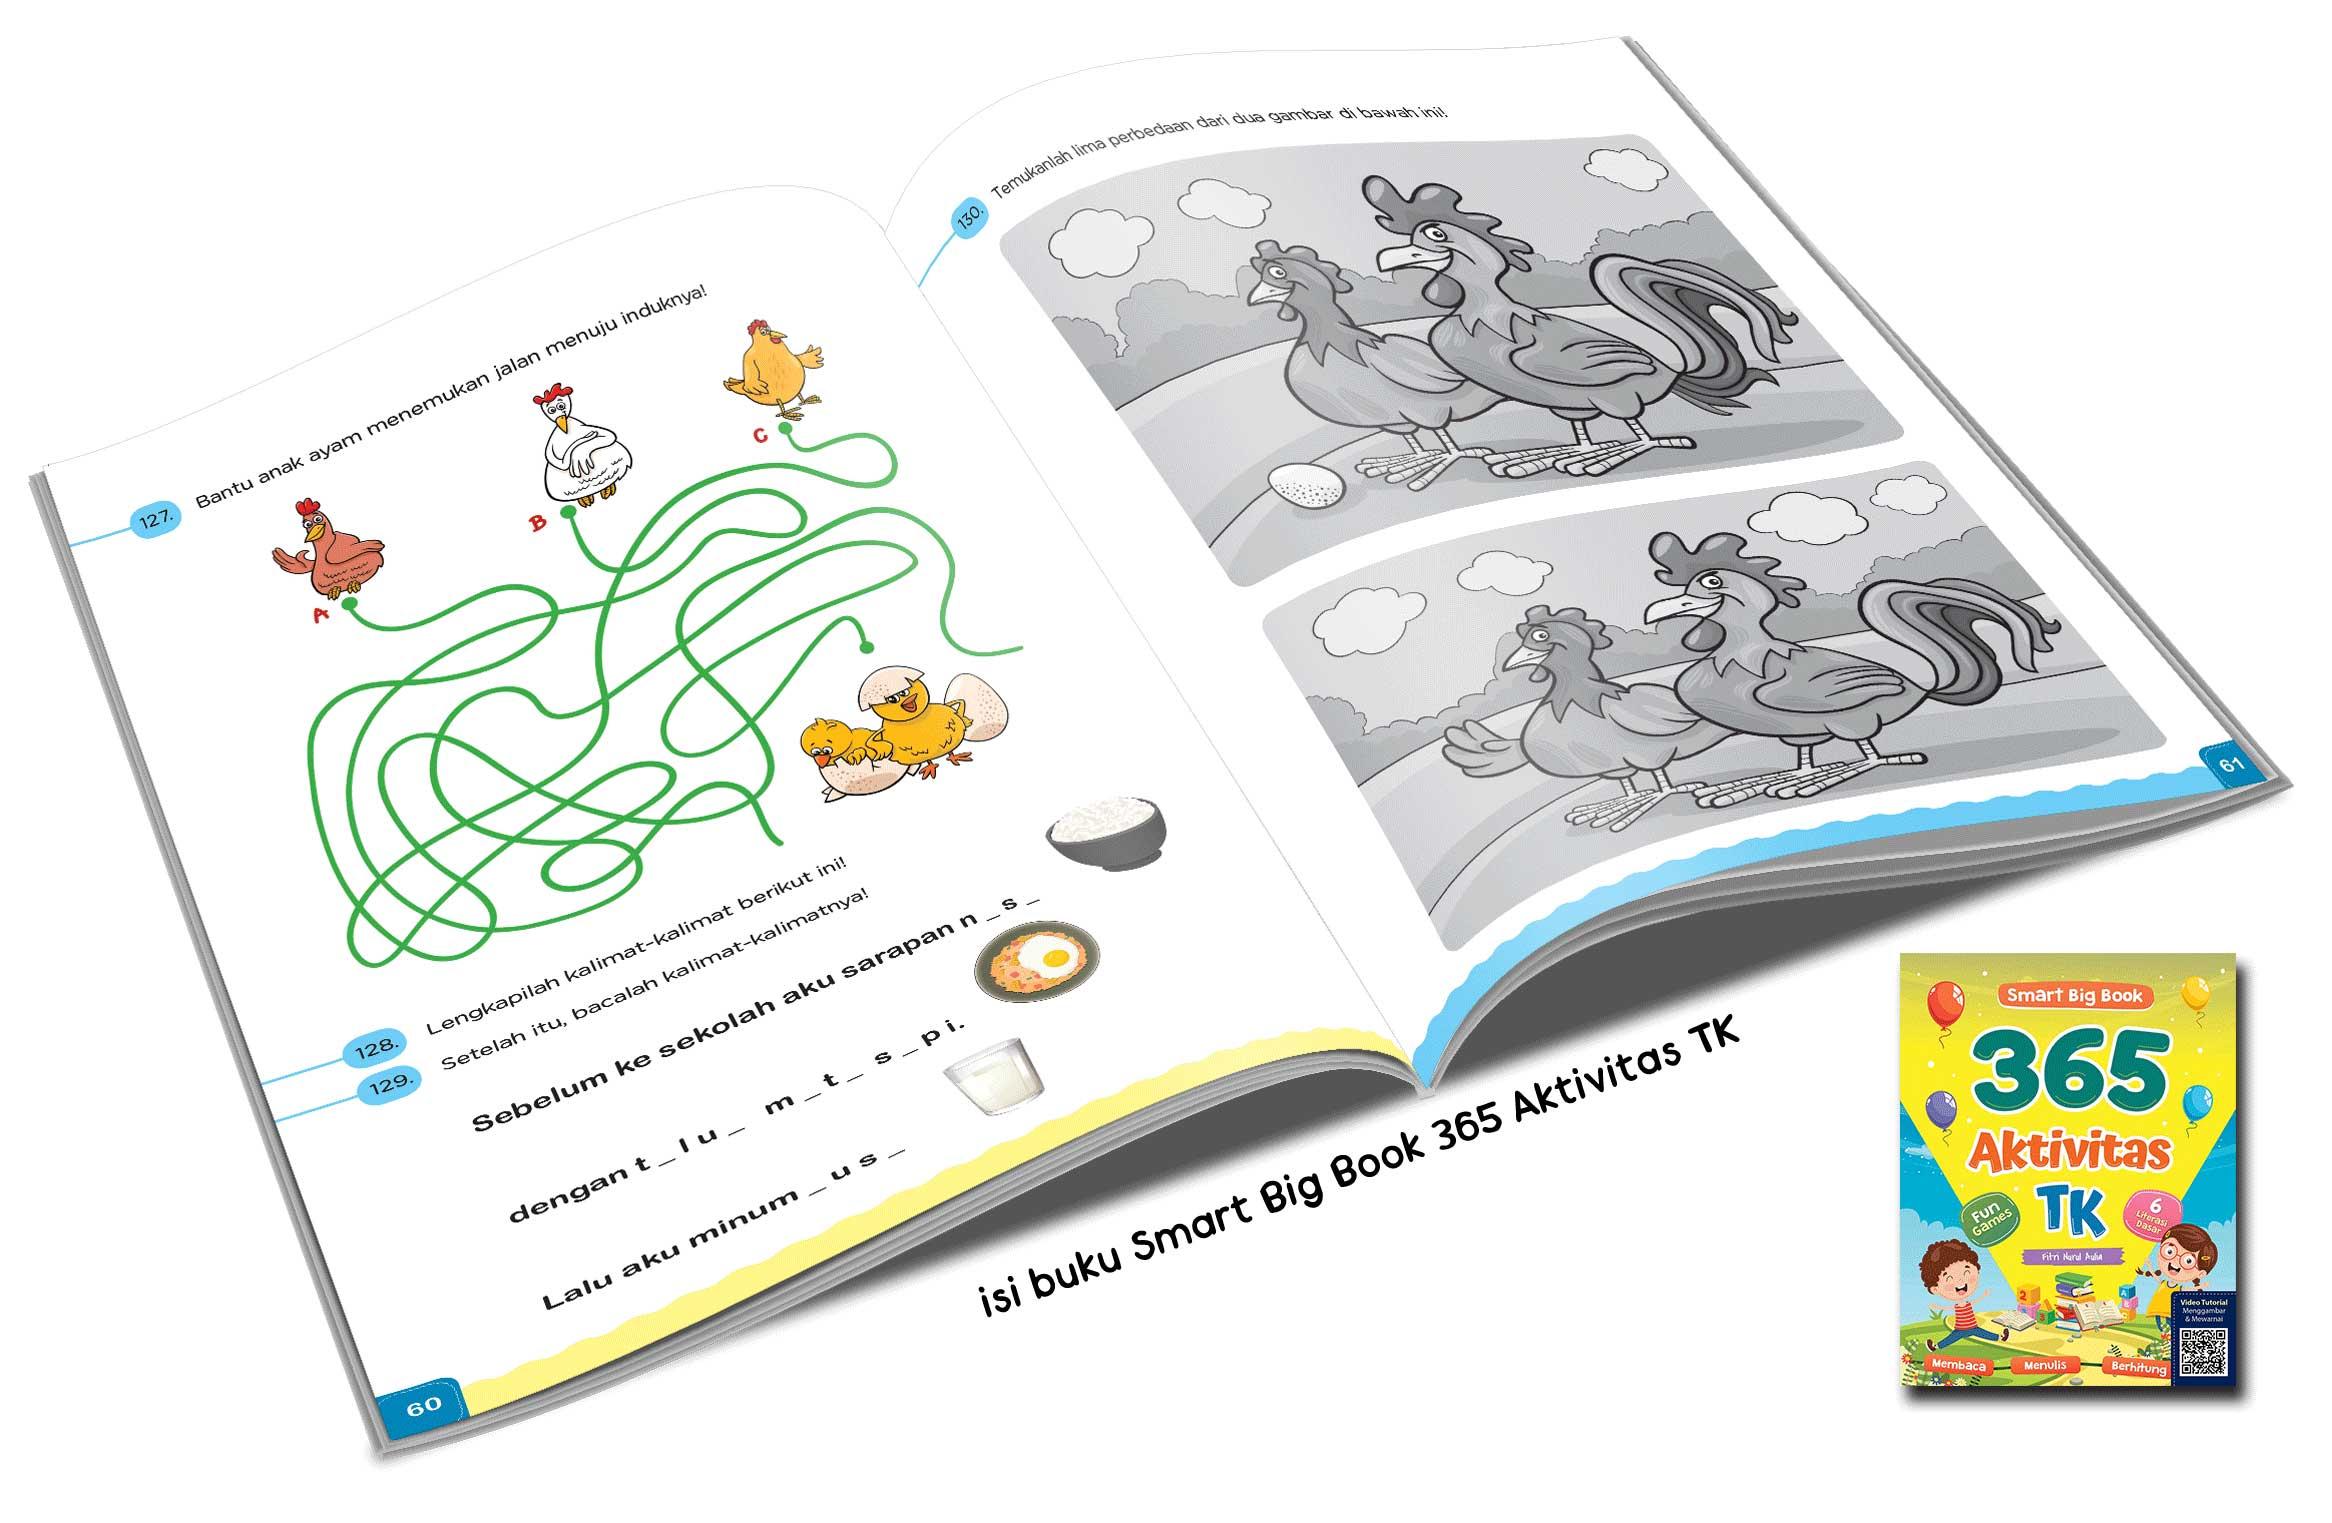 Gerakan Literasi Dengan Rujukan 4 Buku Smart Big Book Cikal Aksara